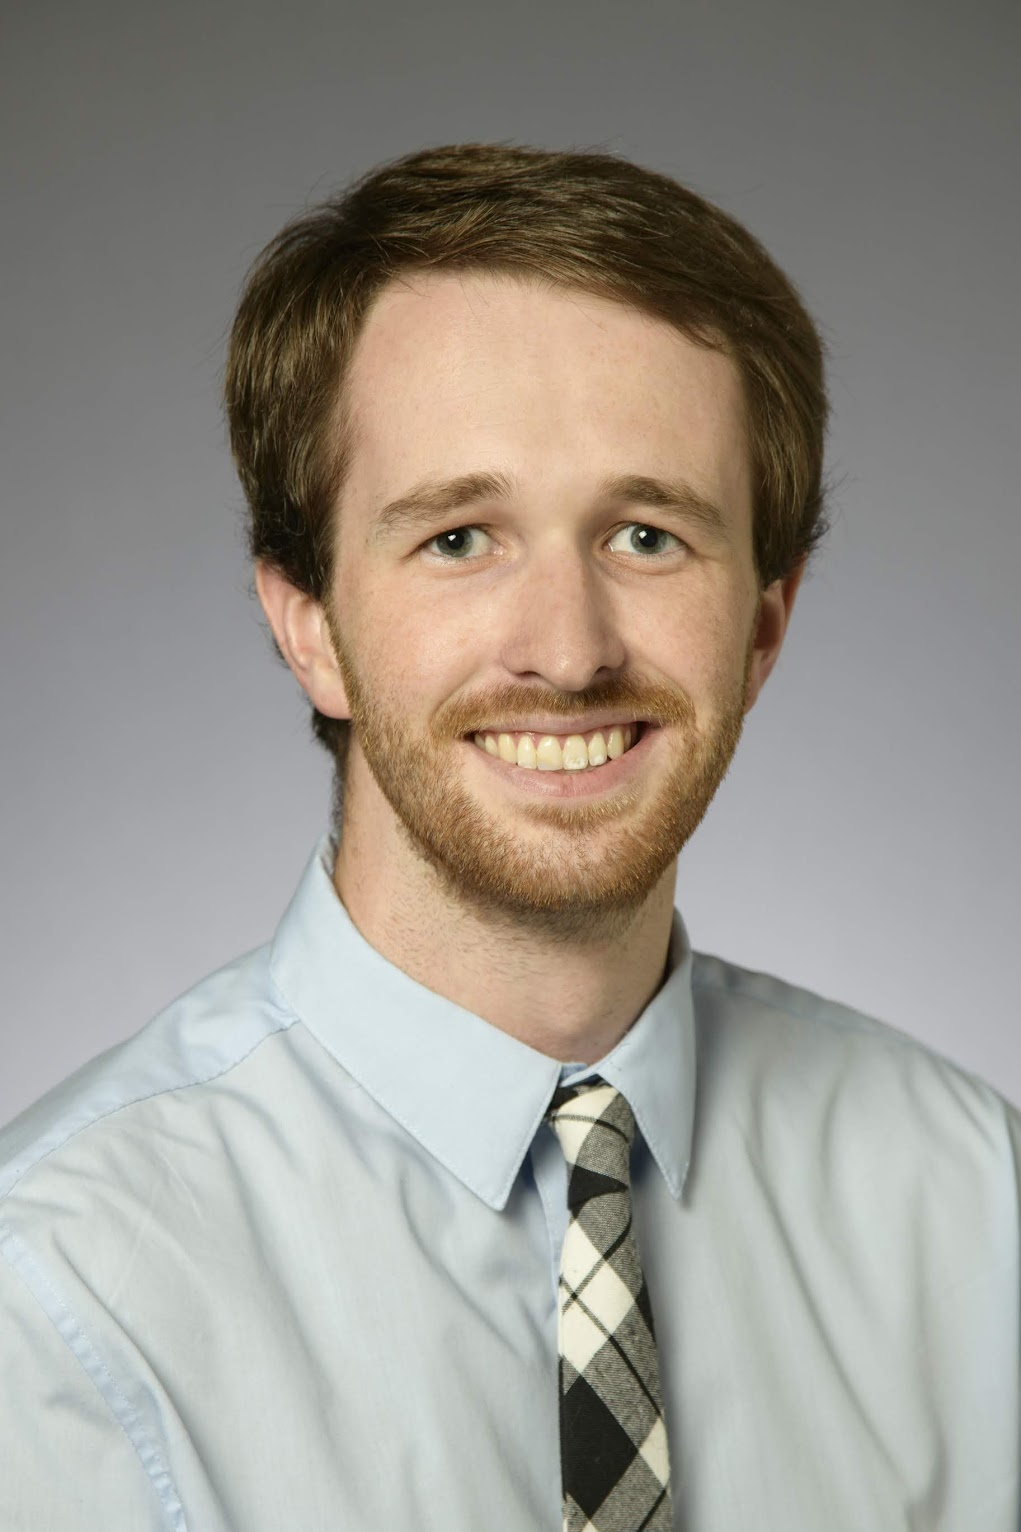 Spencer Krieger